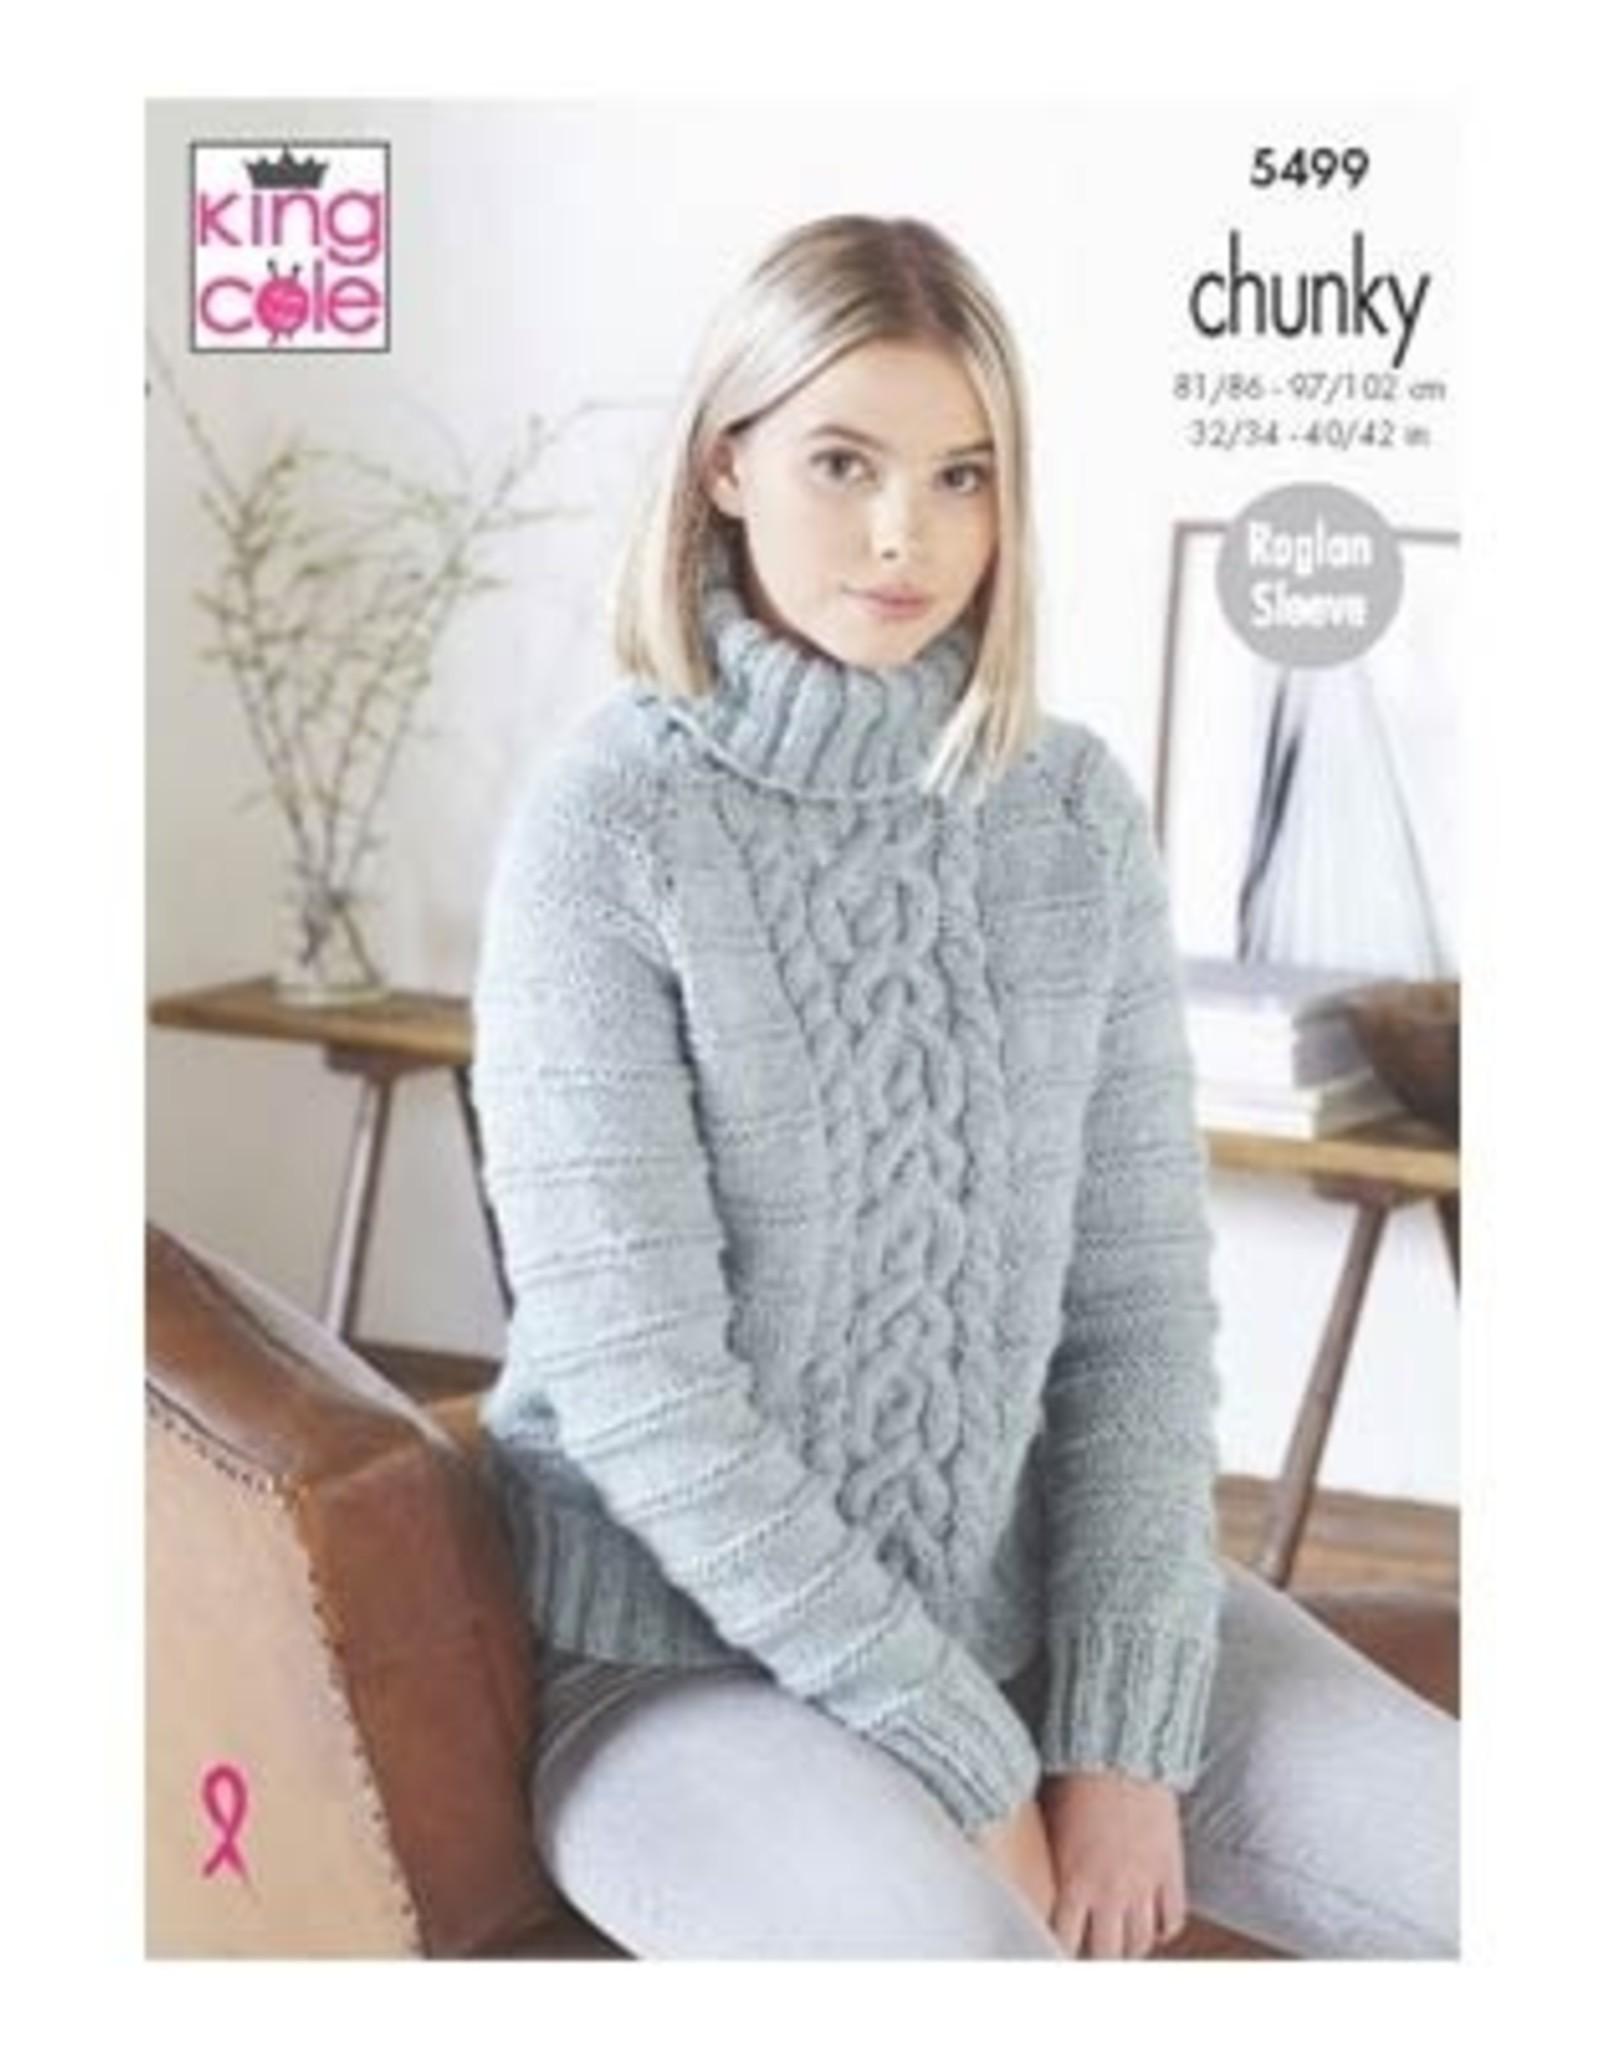 King Cole Pattern - Unisex Chunky Sweater